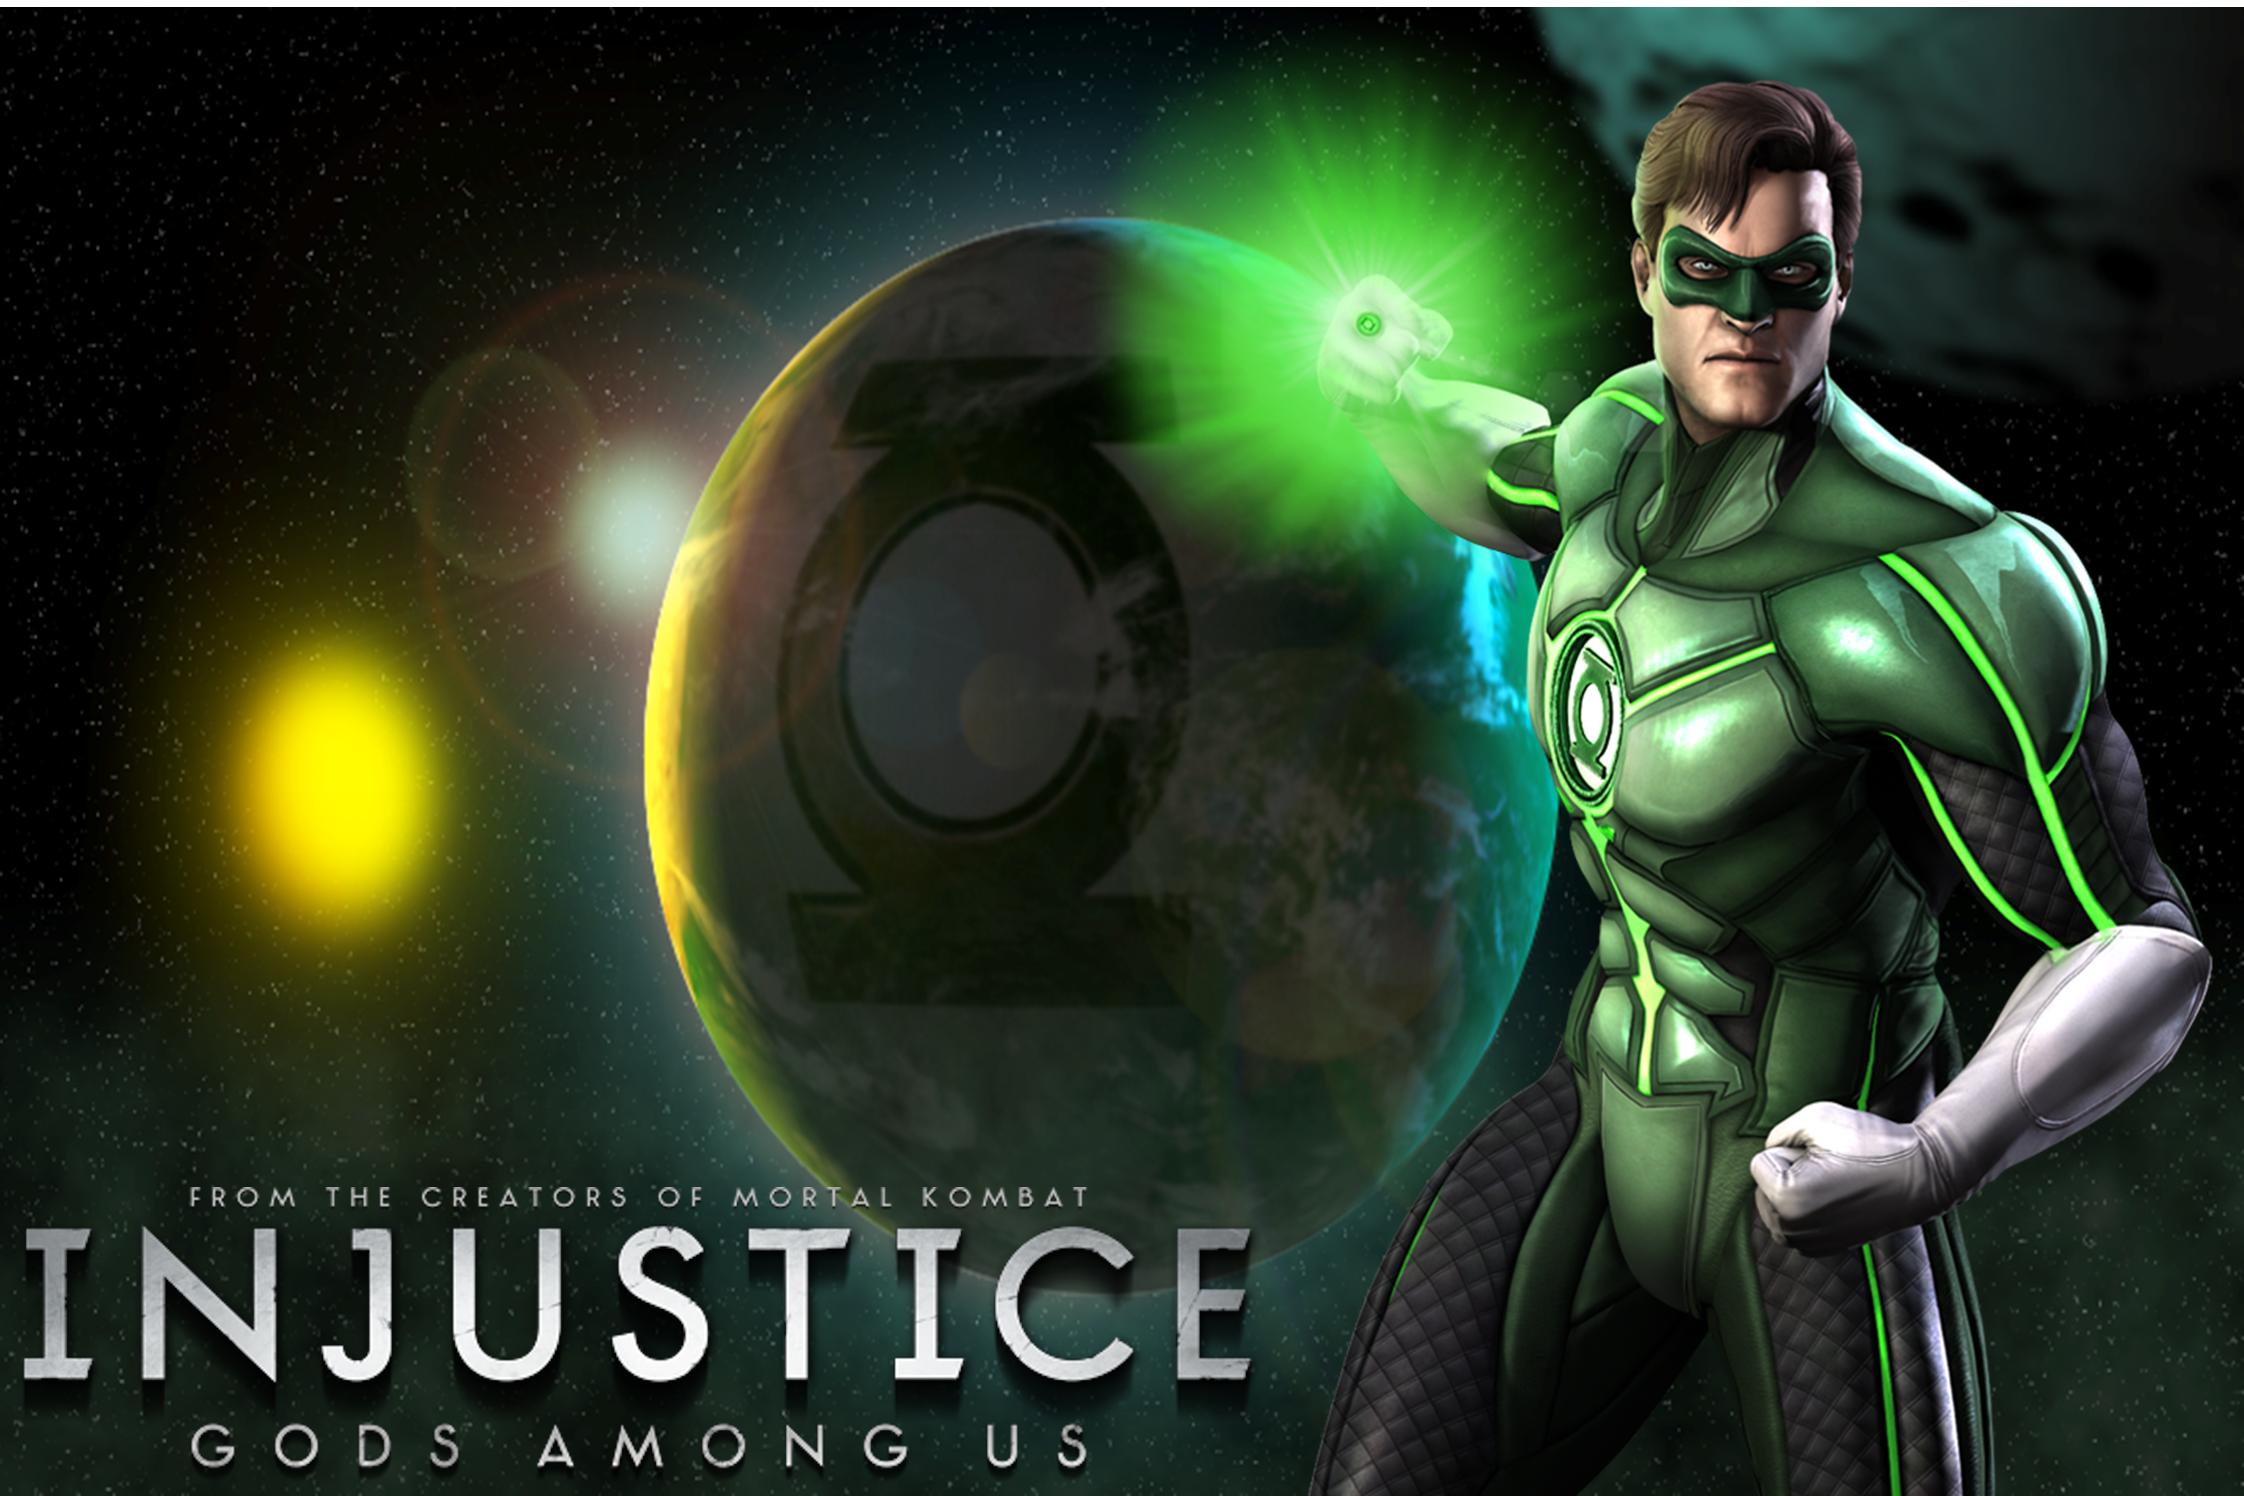 Injustice Green Lantern Wallpaper Green Lantern Wallpaper Green Lantern Lanterns